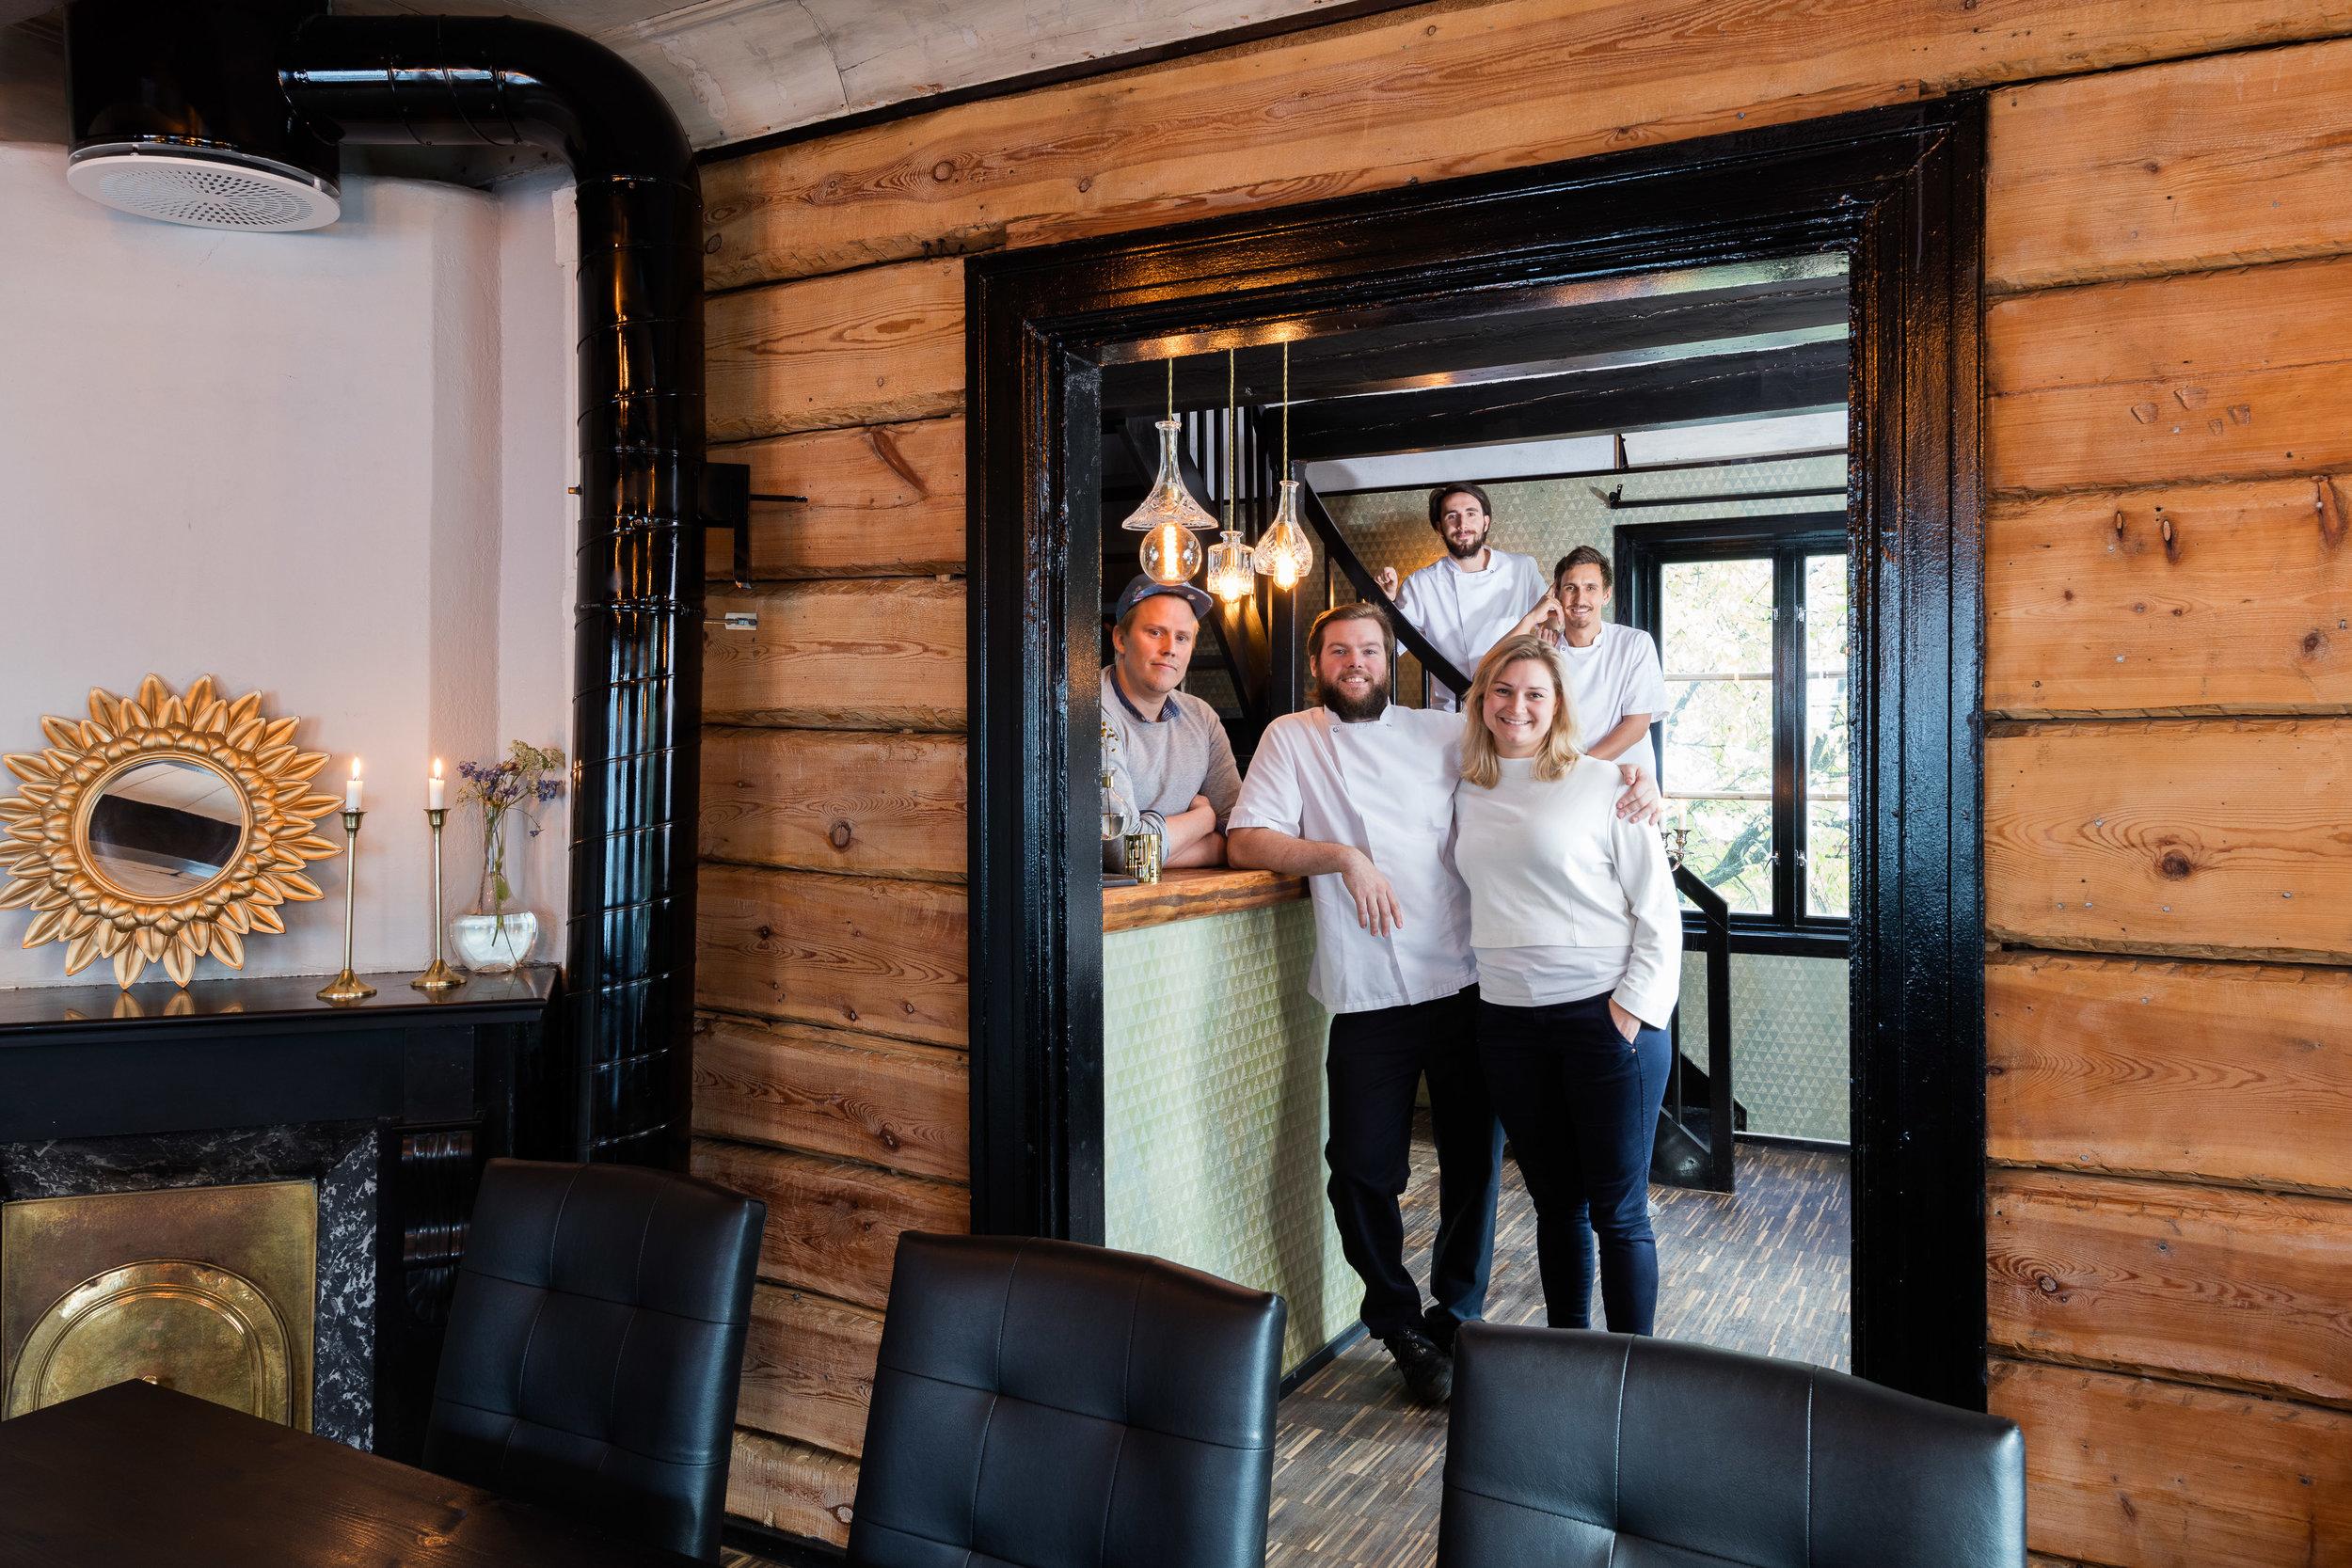 De fem vennene Marius,Gabriela,Thoralf,Bjørn og Håkon ønsker deg velkommen til Hildr Gastrobar.Foto: Sven-Erik Knoff | www.fotoknoff.no